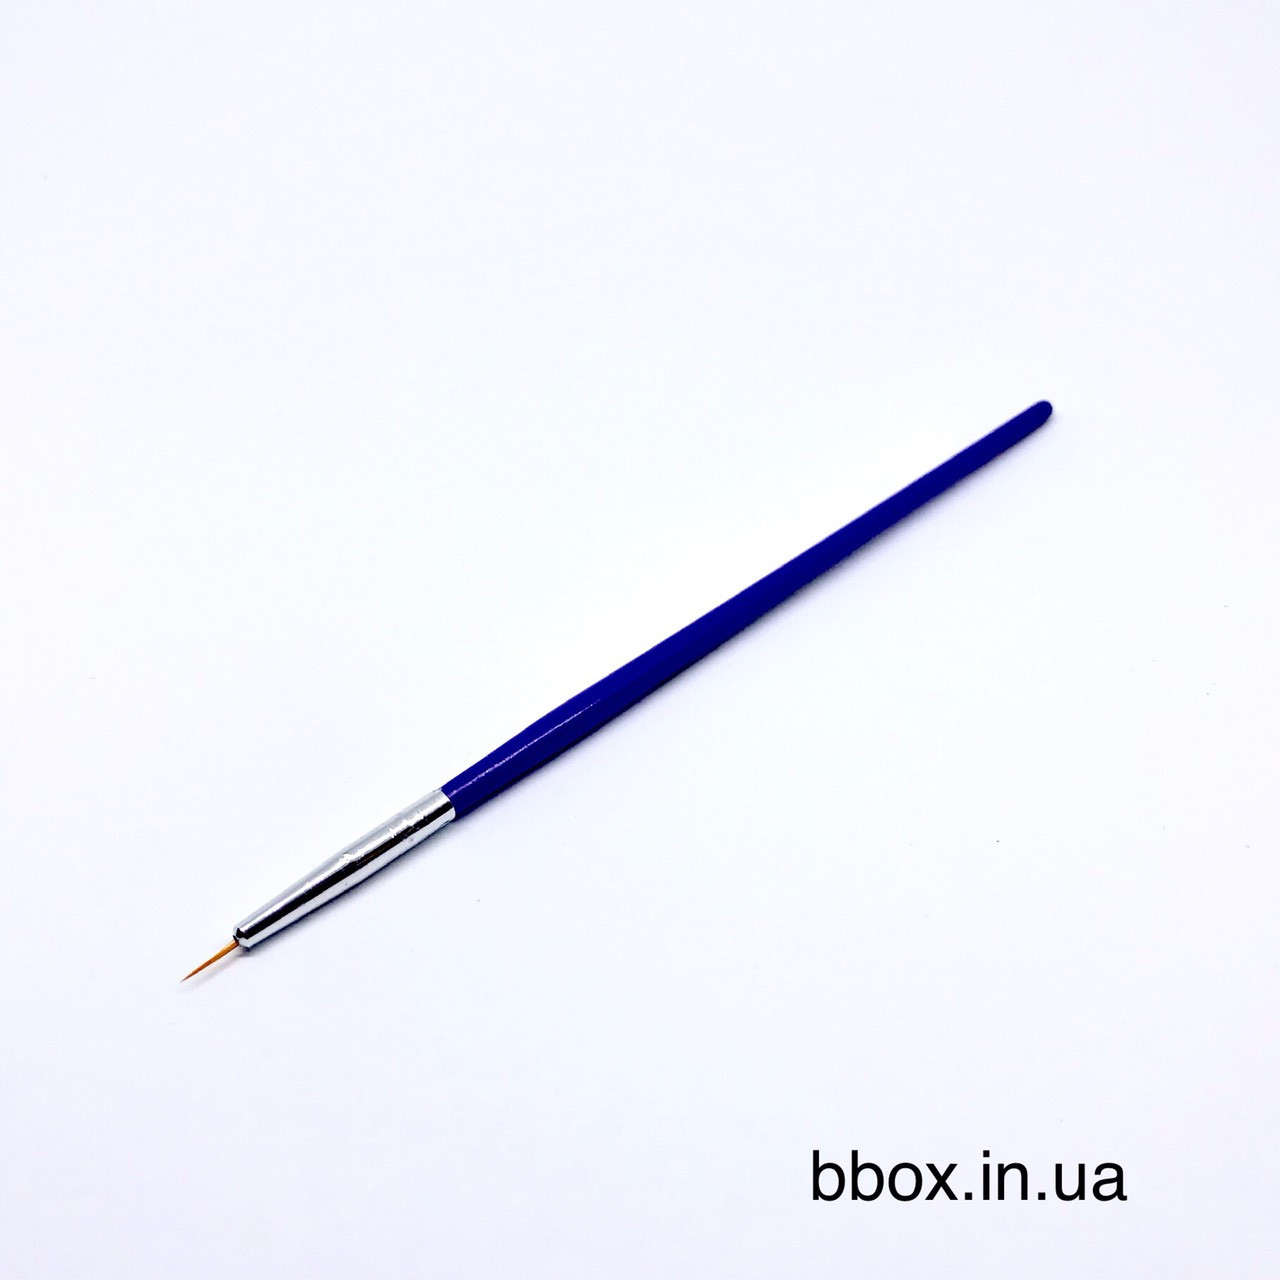 Кисть для рисования KL-3